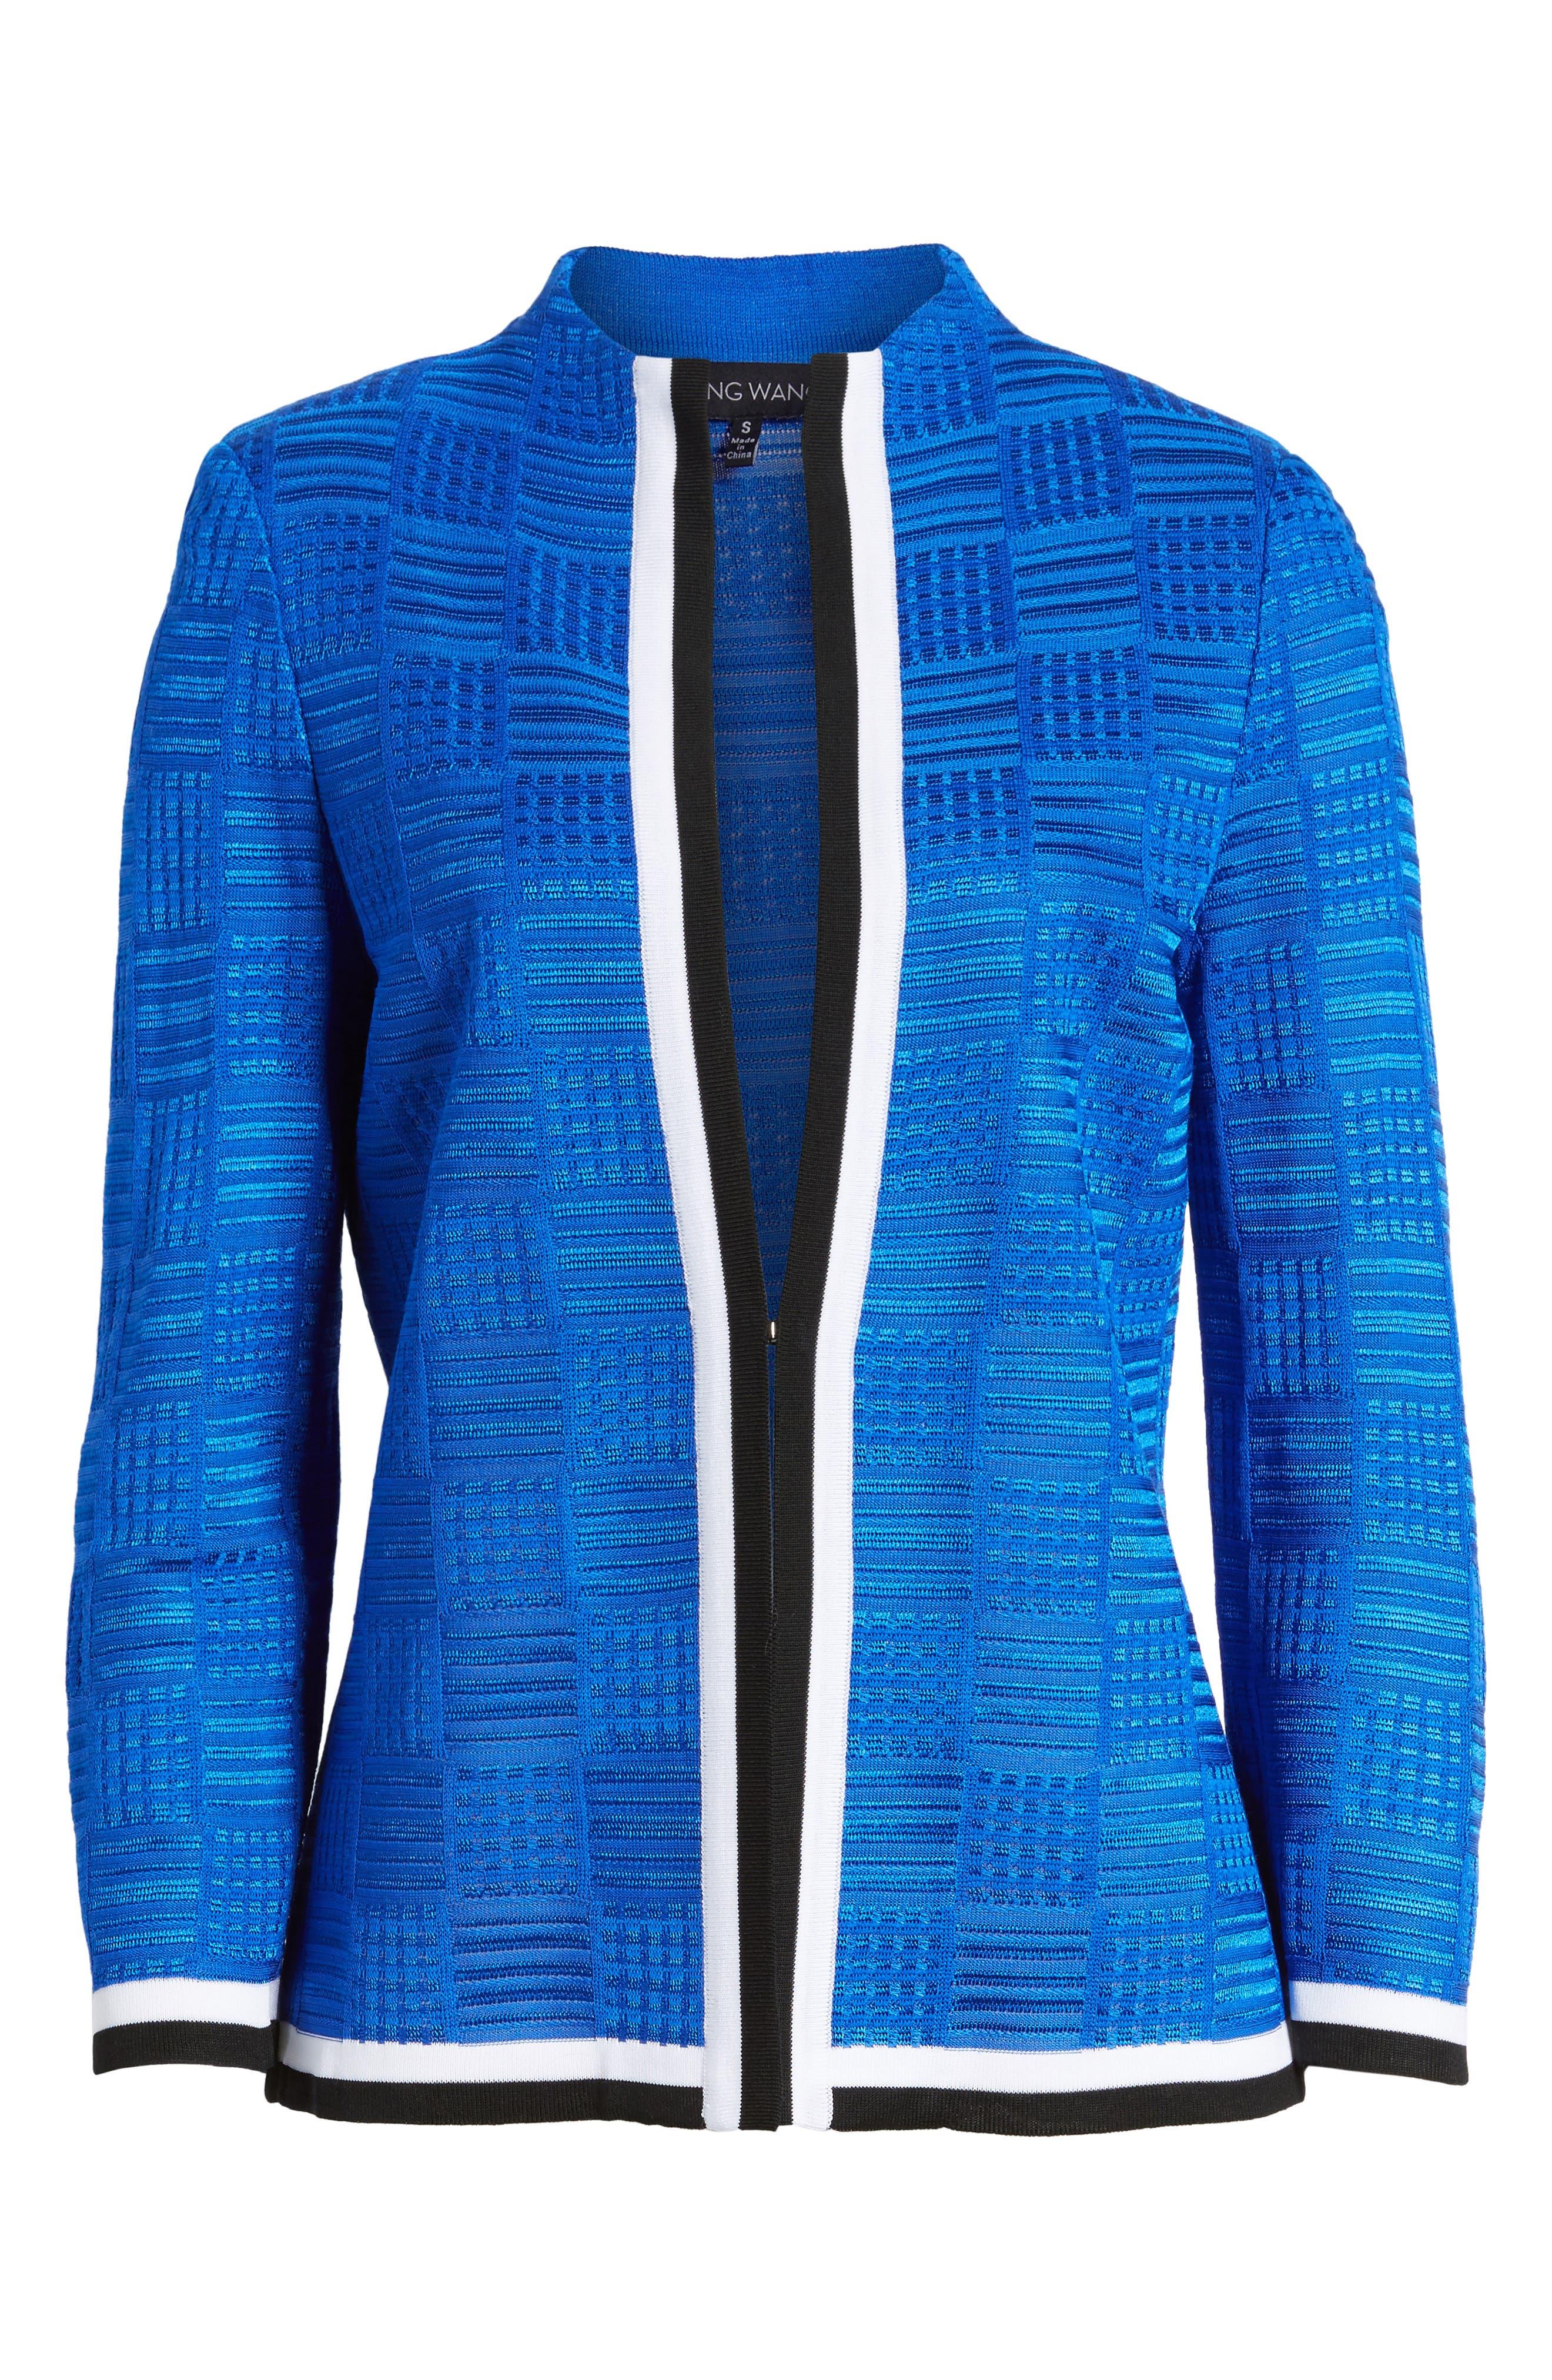 Basketweave Jacquard Jacket,                             Alternate thumbnail 6, color,                             Patriot Blue/ Black/ White